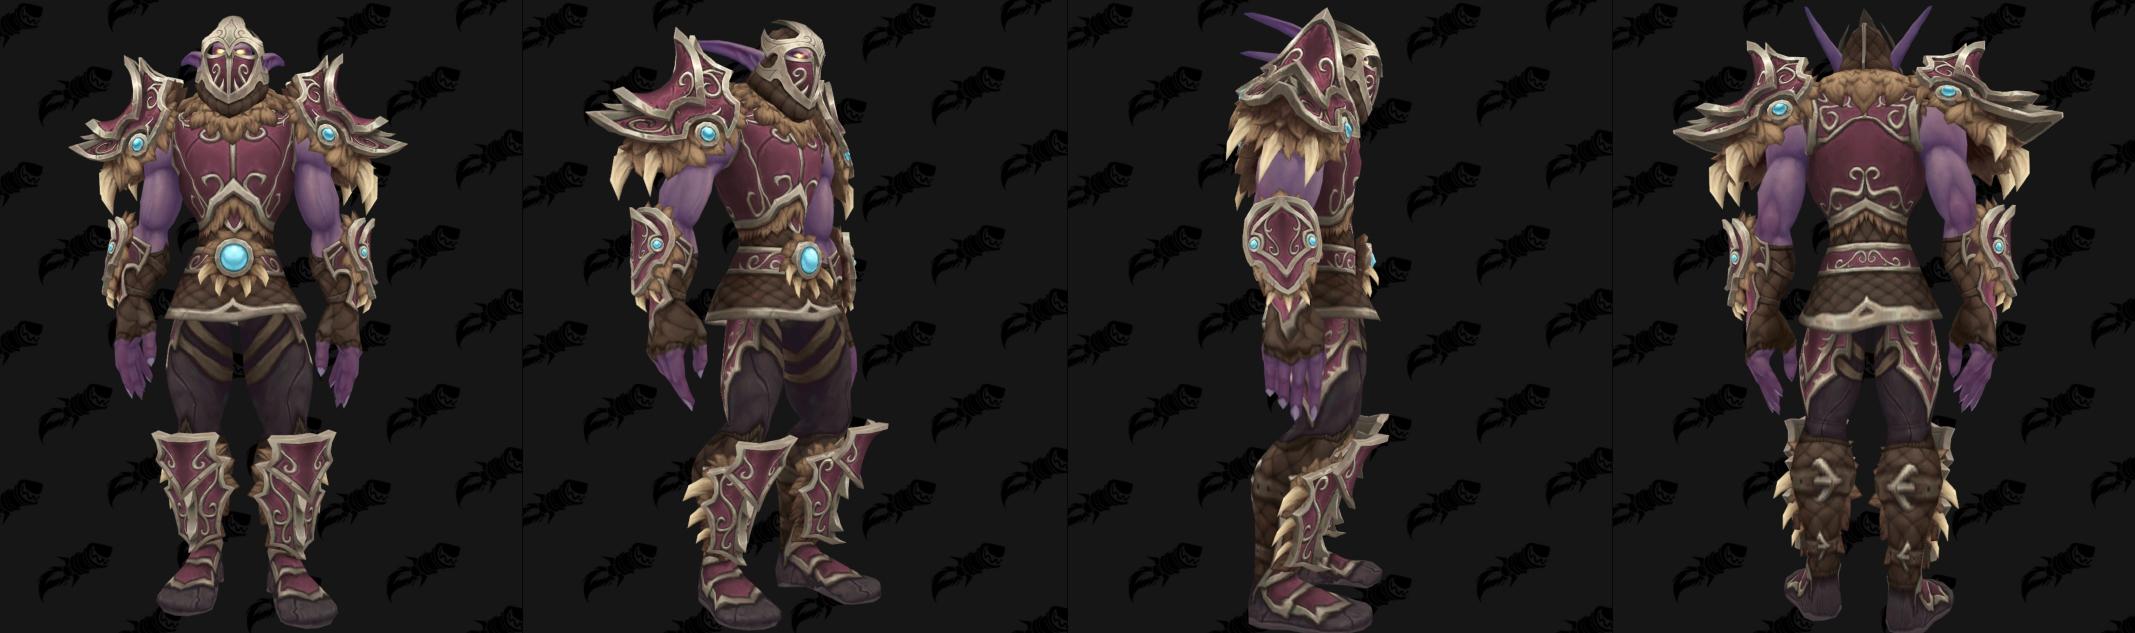 Armure Cuir Alliance - Front de guerre Sombrivage Tier 3